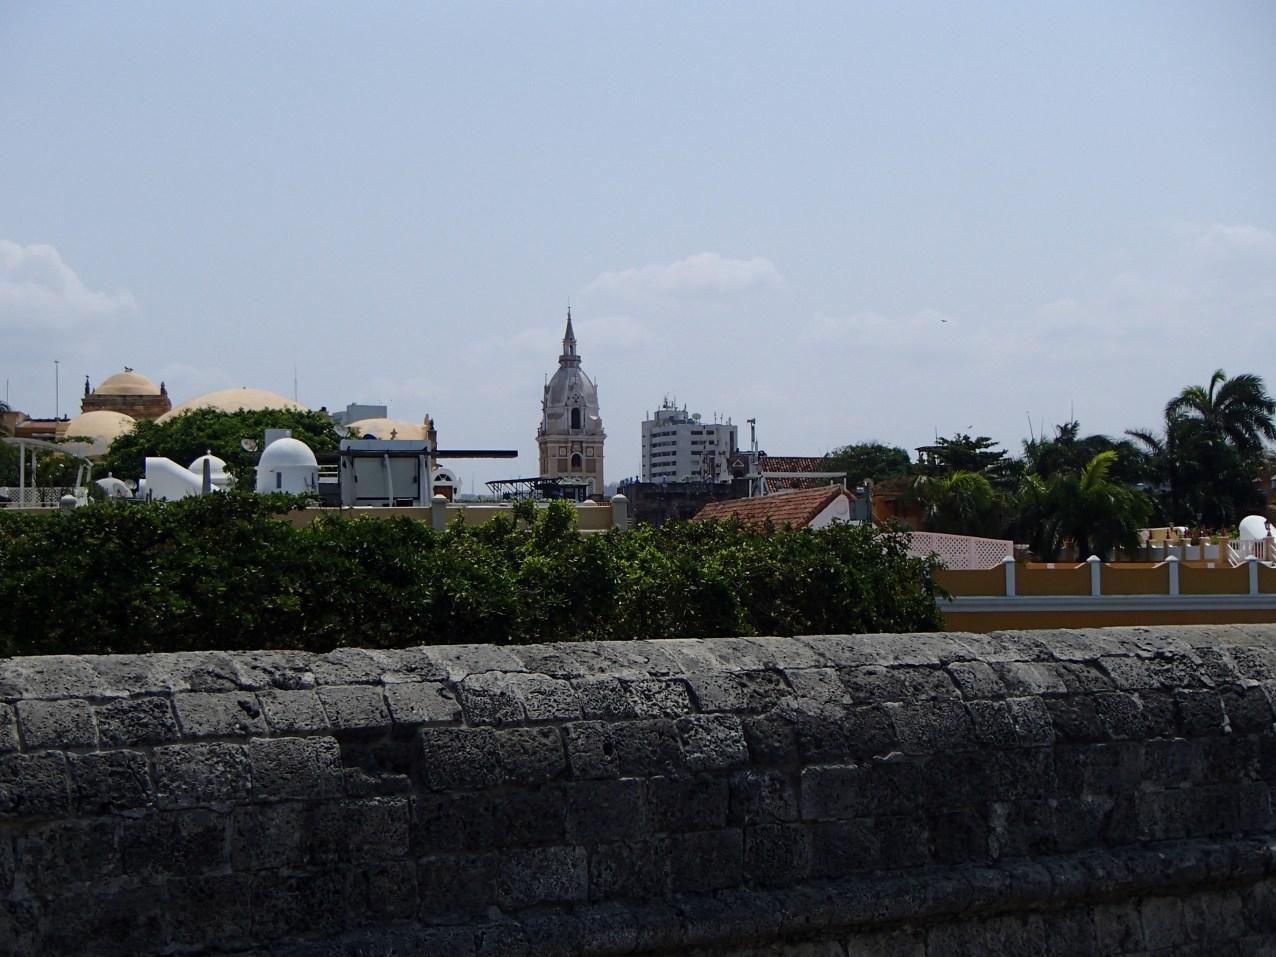 The wall around Cartagena